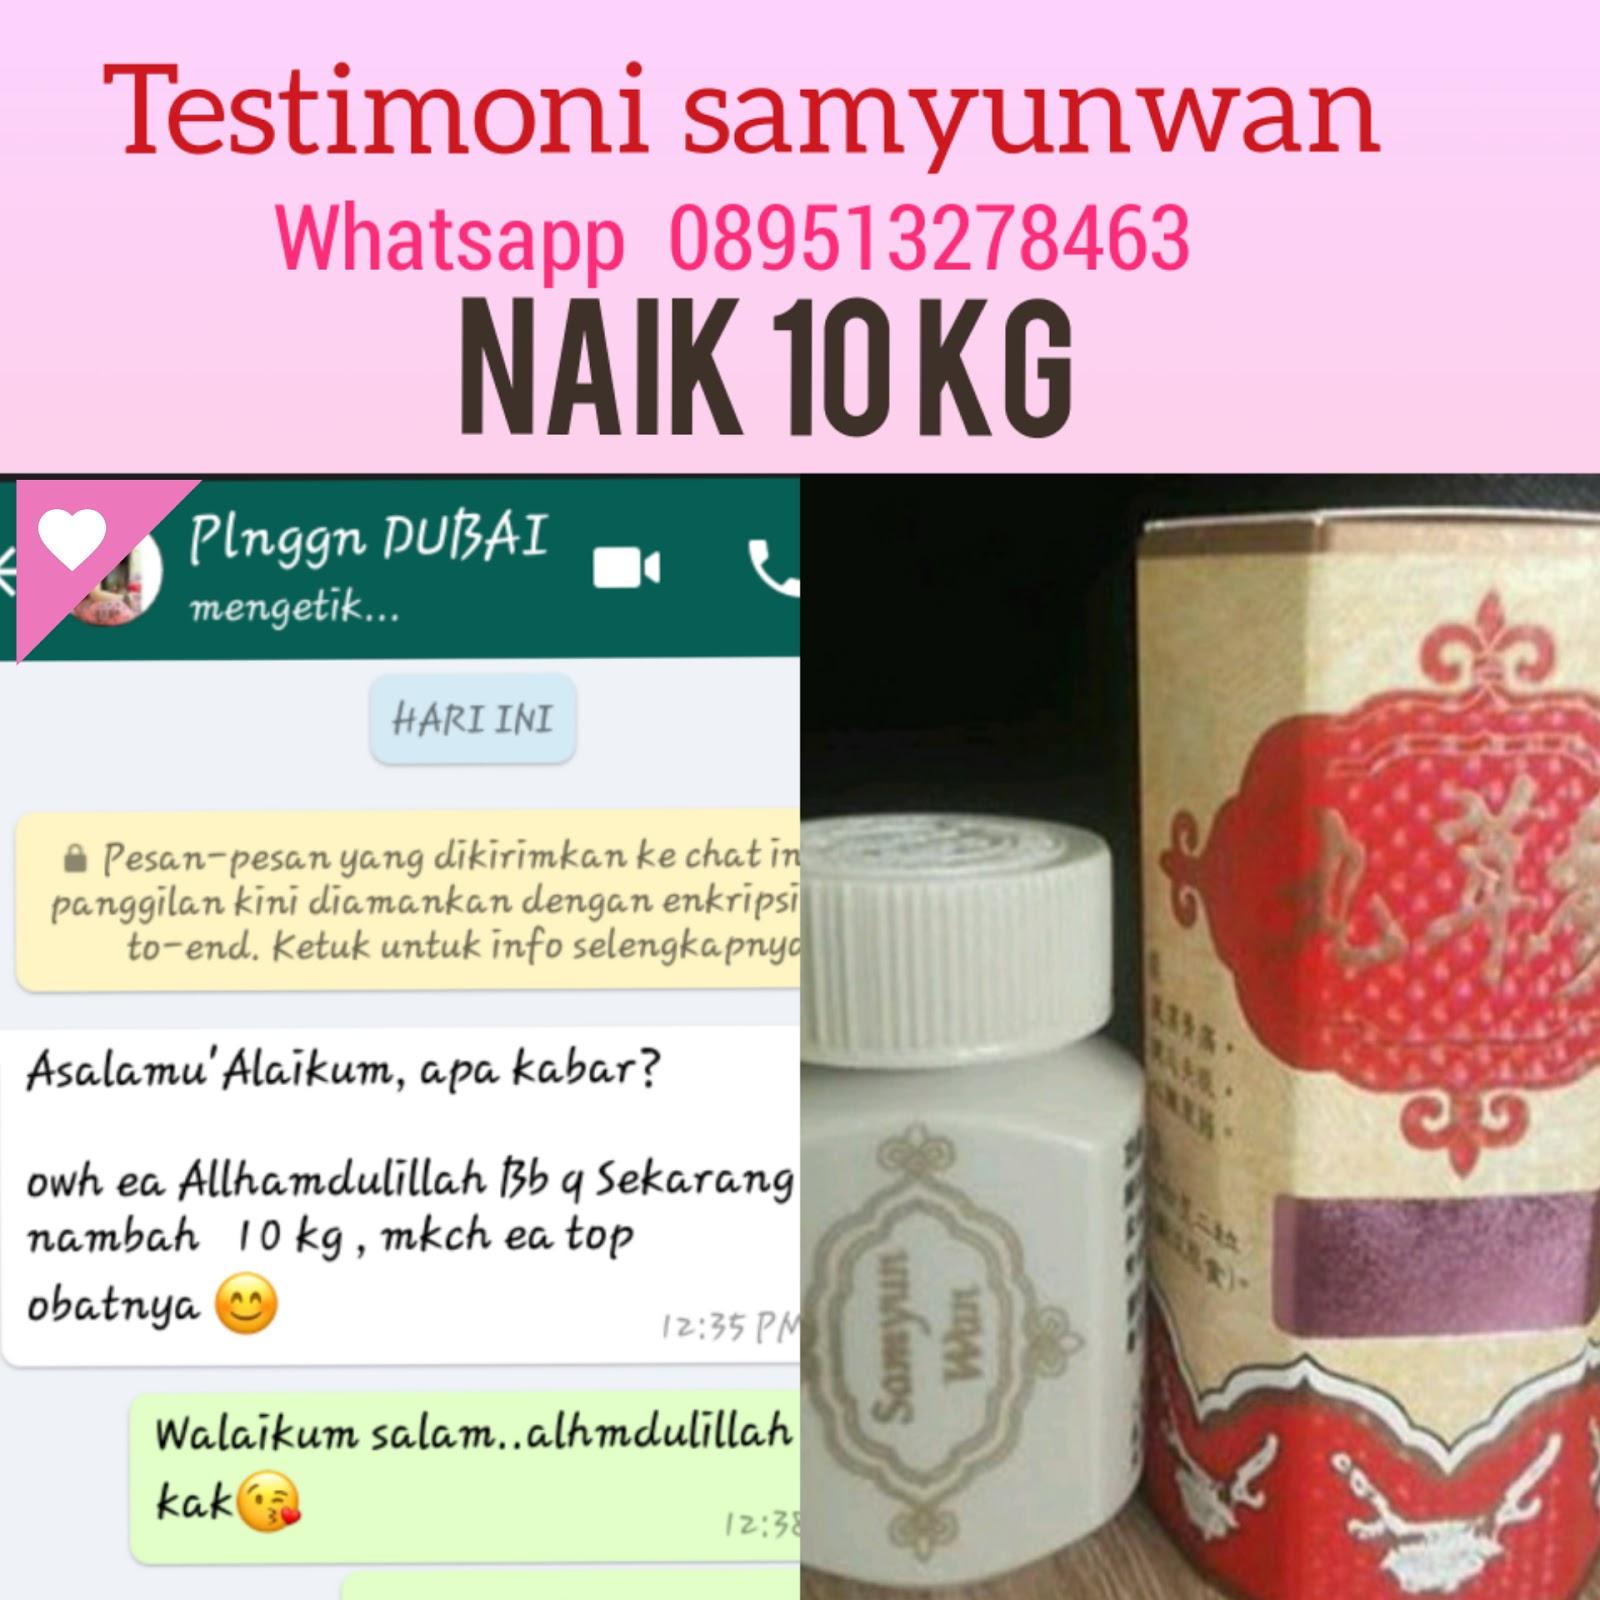 Samyunwan Penggemuk Badan Sam Yun Wan Samyun Wisdom Original Obat Penambah Nafsu Makan Hasil Testimoni Kami Hati